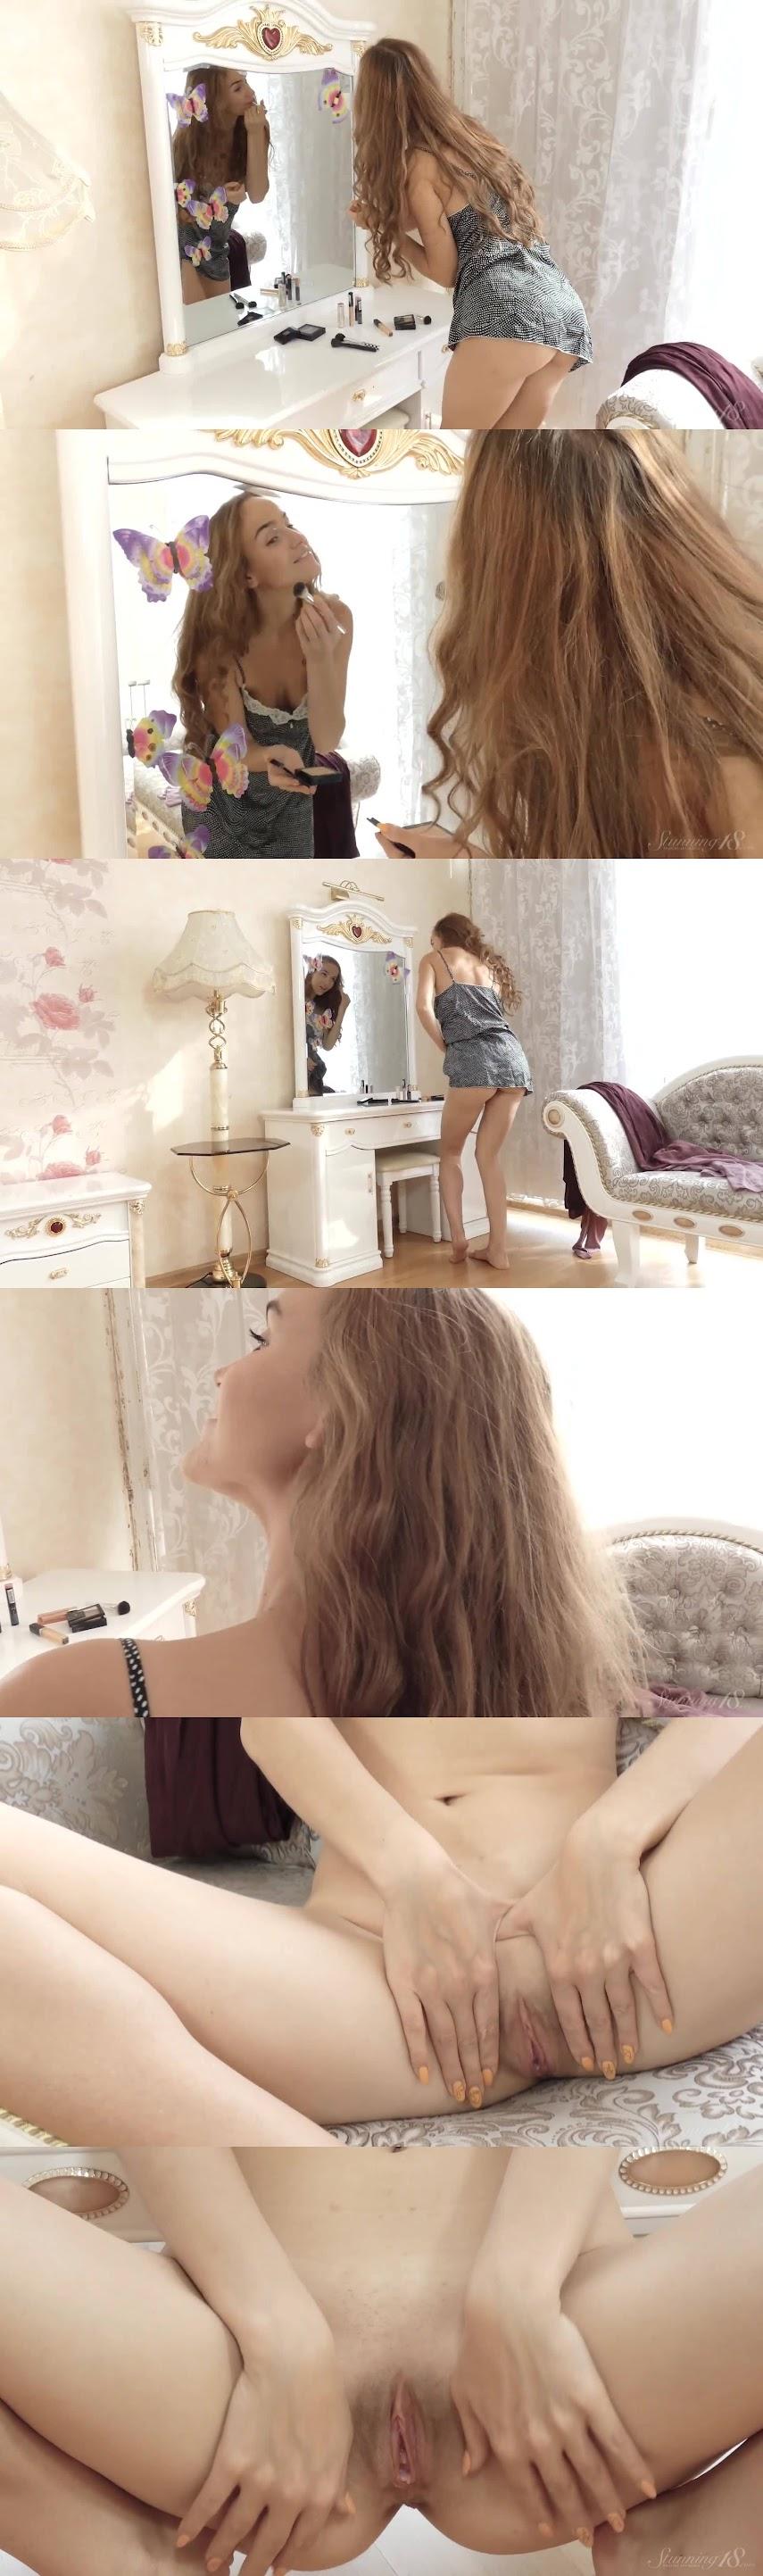 0837850426 [Stunning18] Eva Jolie - Gentle Morning